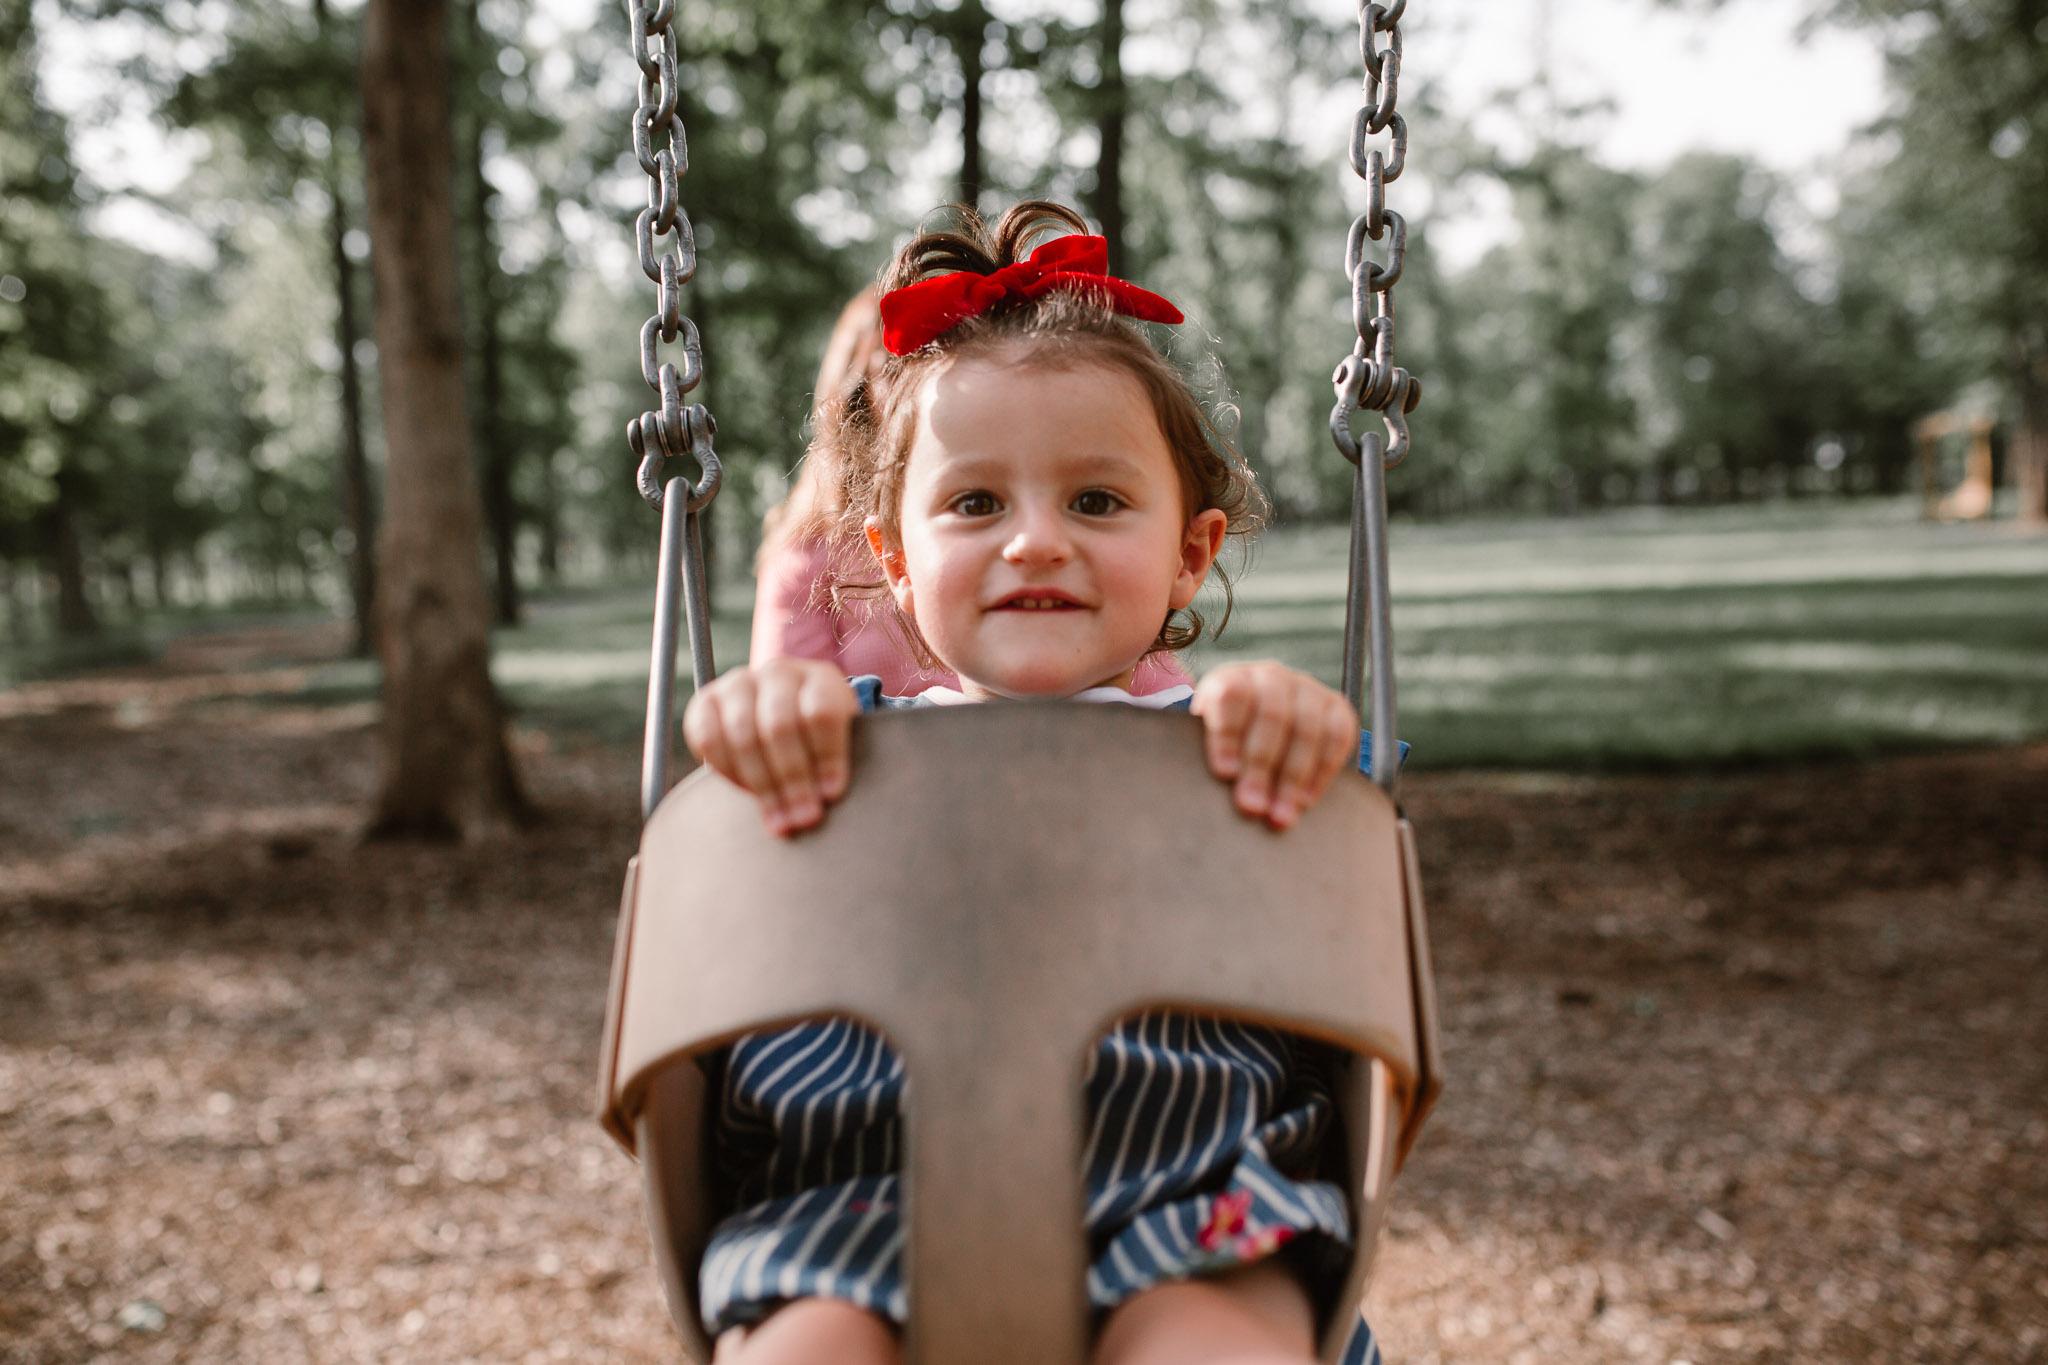 Toddler swinging at The Barn at One Loudoun in Ashburn, Virginia